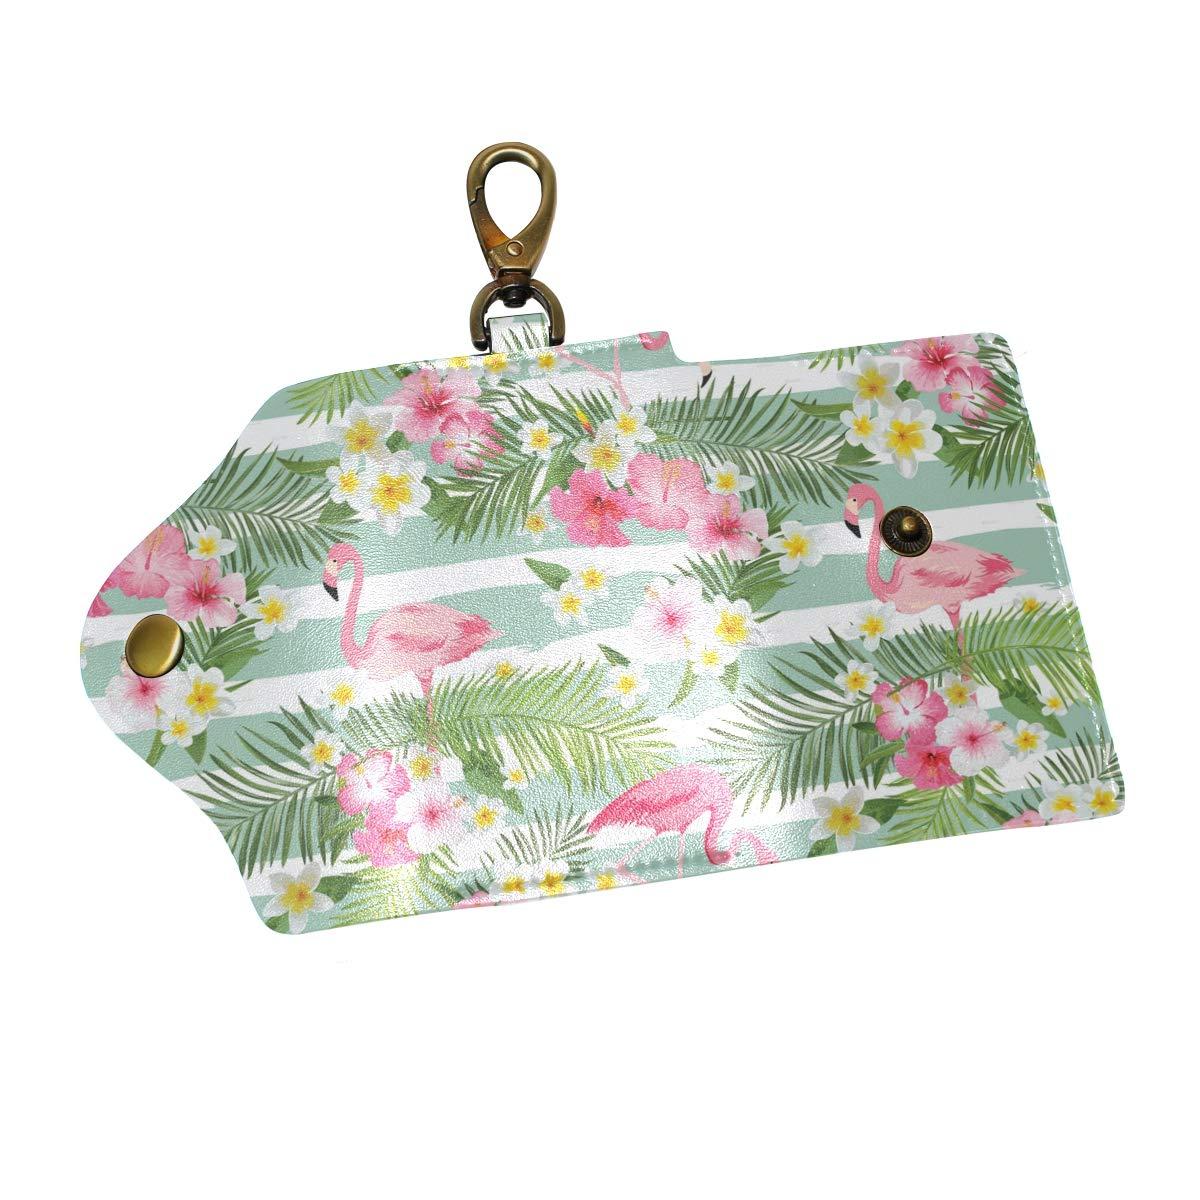 KEAKIA Tropical Flamingo Leather Key Case Wallets Tri-fold Key Holder Keychains with 6 Hooks 2 Slot Snap Closure for Men Women